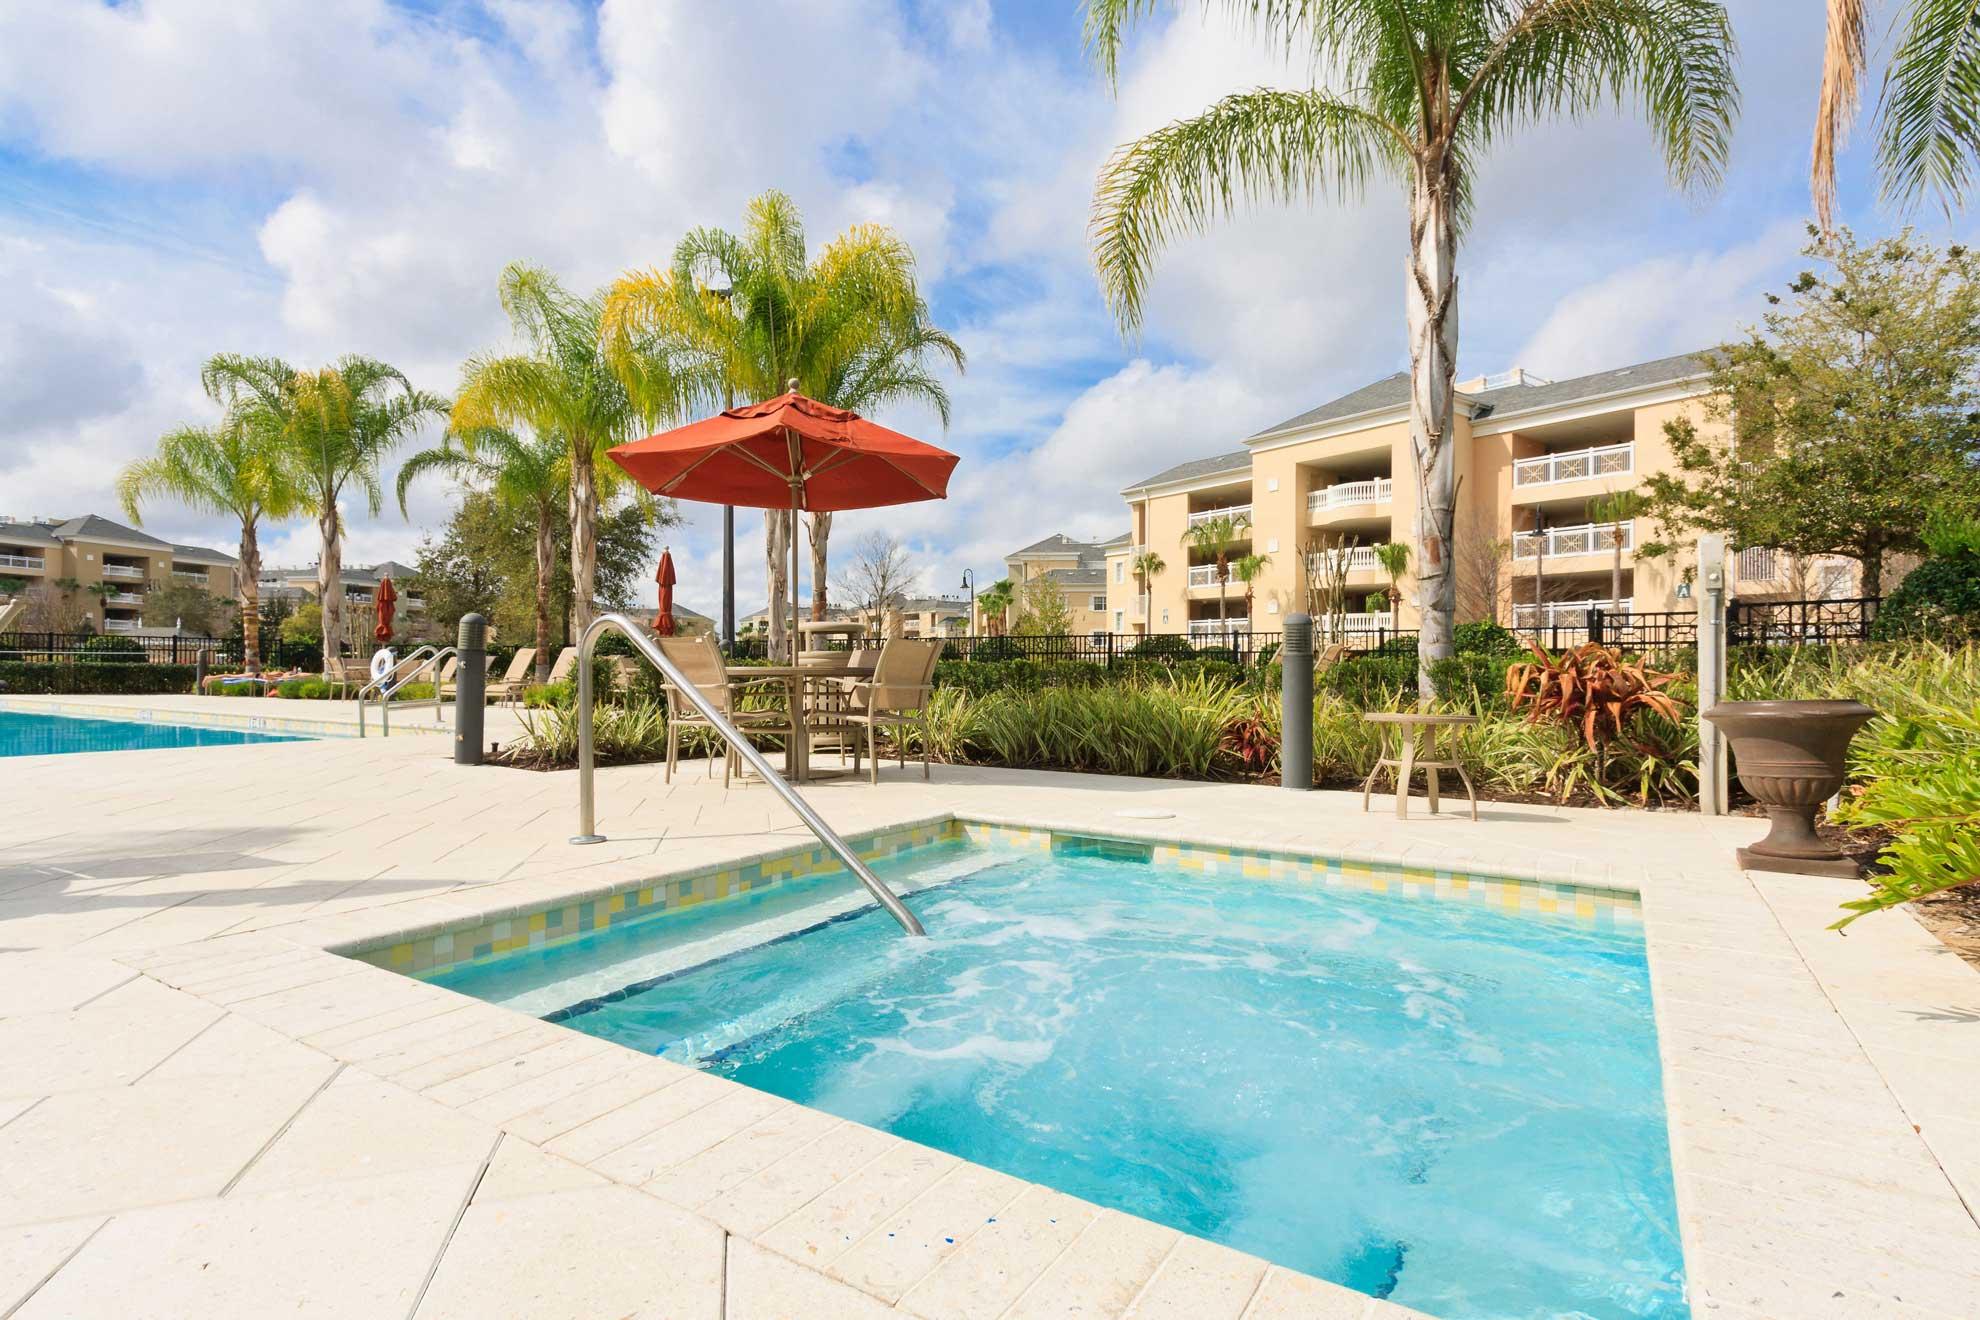 Center Court Spa at Reunion Resort